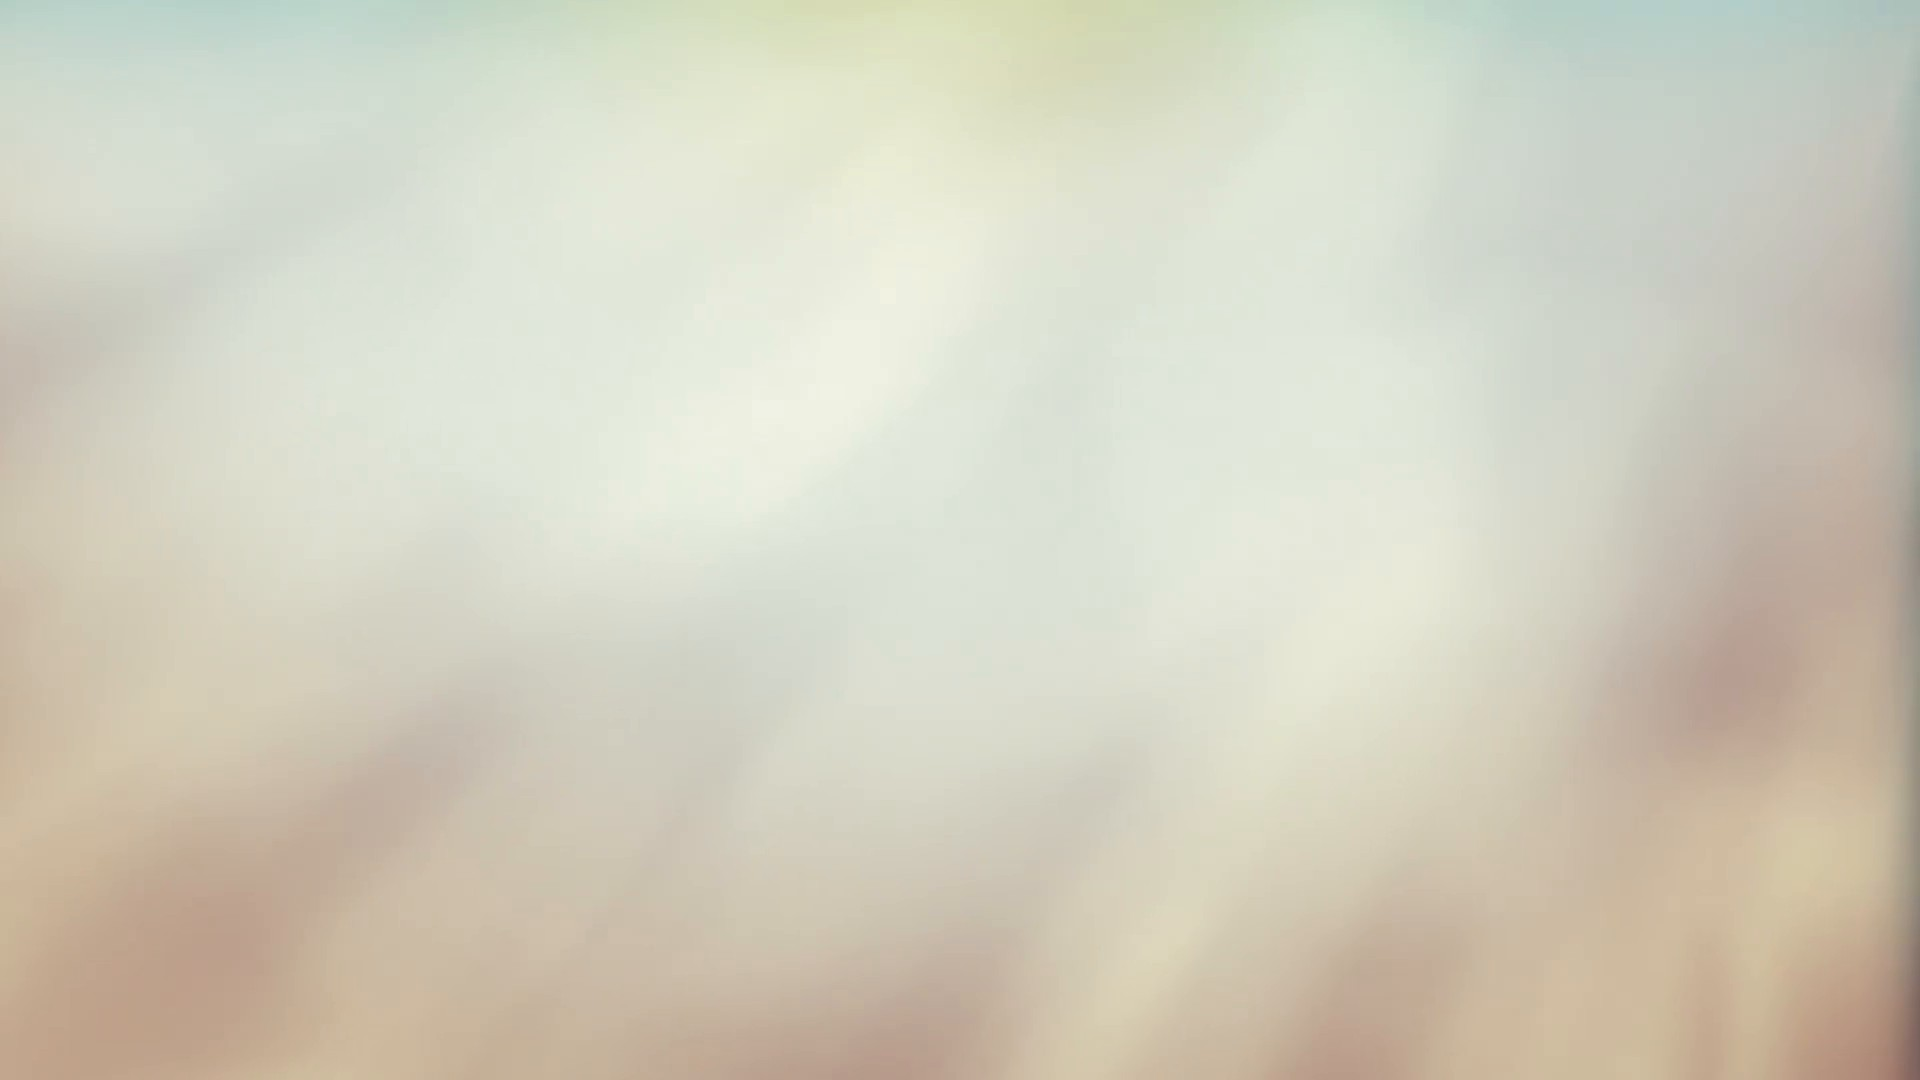 Pastel Blue background ·① Download free High Resolution ...